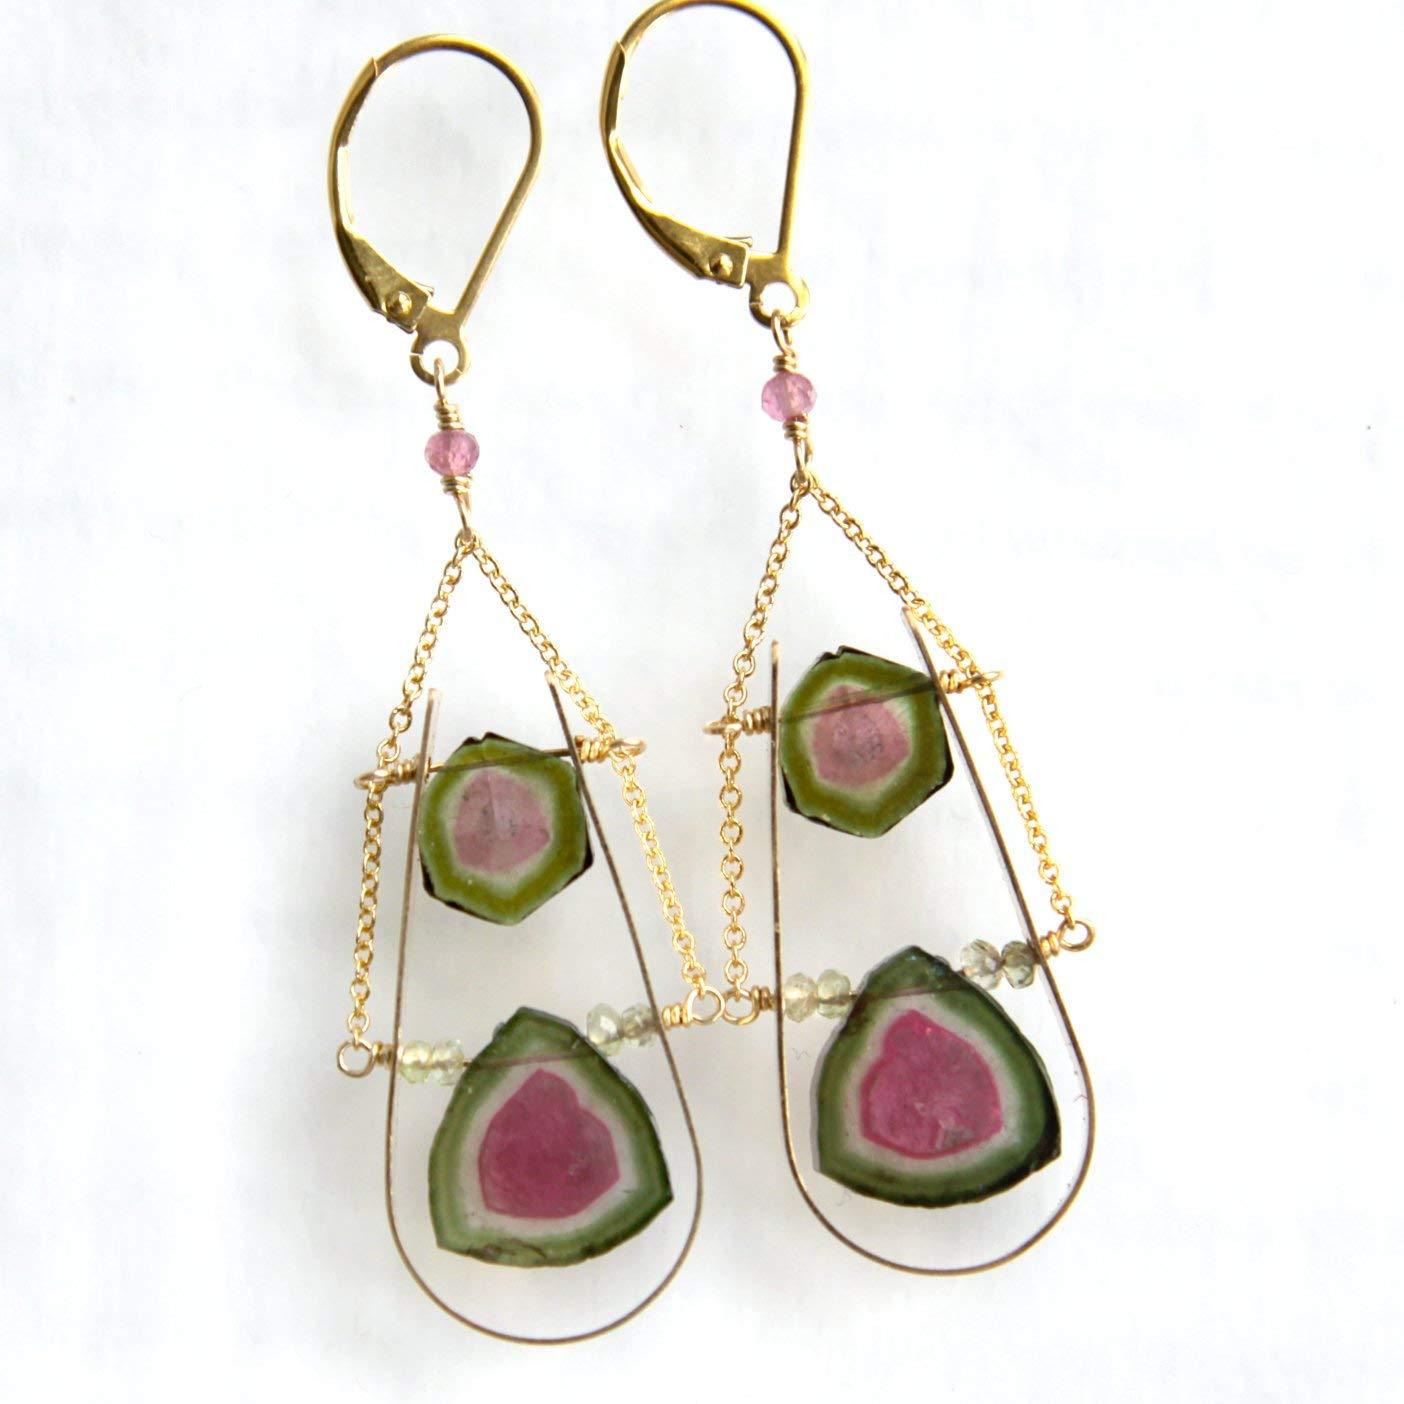 Fashion Punk Gothic Rock Ear Stud Party Fancy Vintage Earrings Women Jewelry Necklace Jewelry Crafting Key Chain Bracelet Pendants Accessories Best